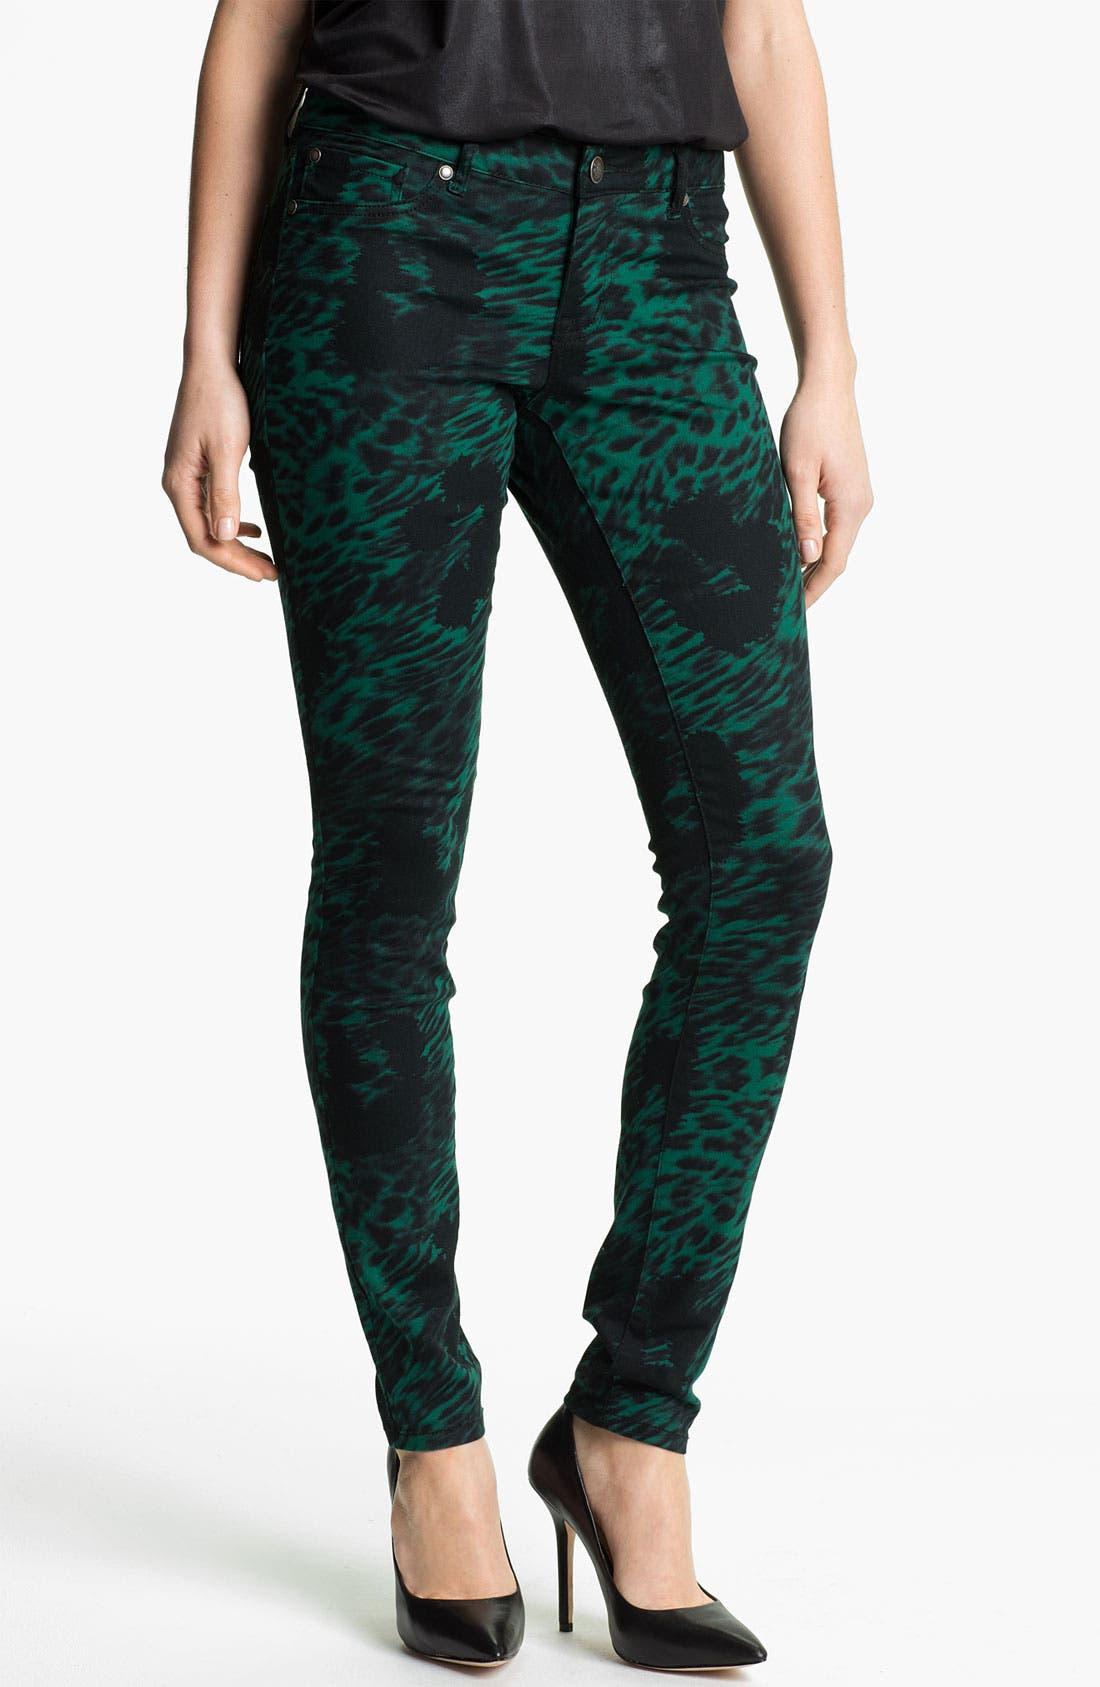 Alternate Image 1 Selected - Jessica Simpson 'Kiss Me' Print Twill Skinny Jeans